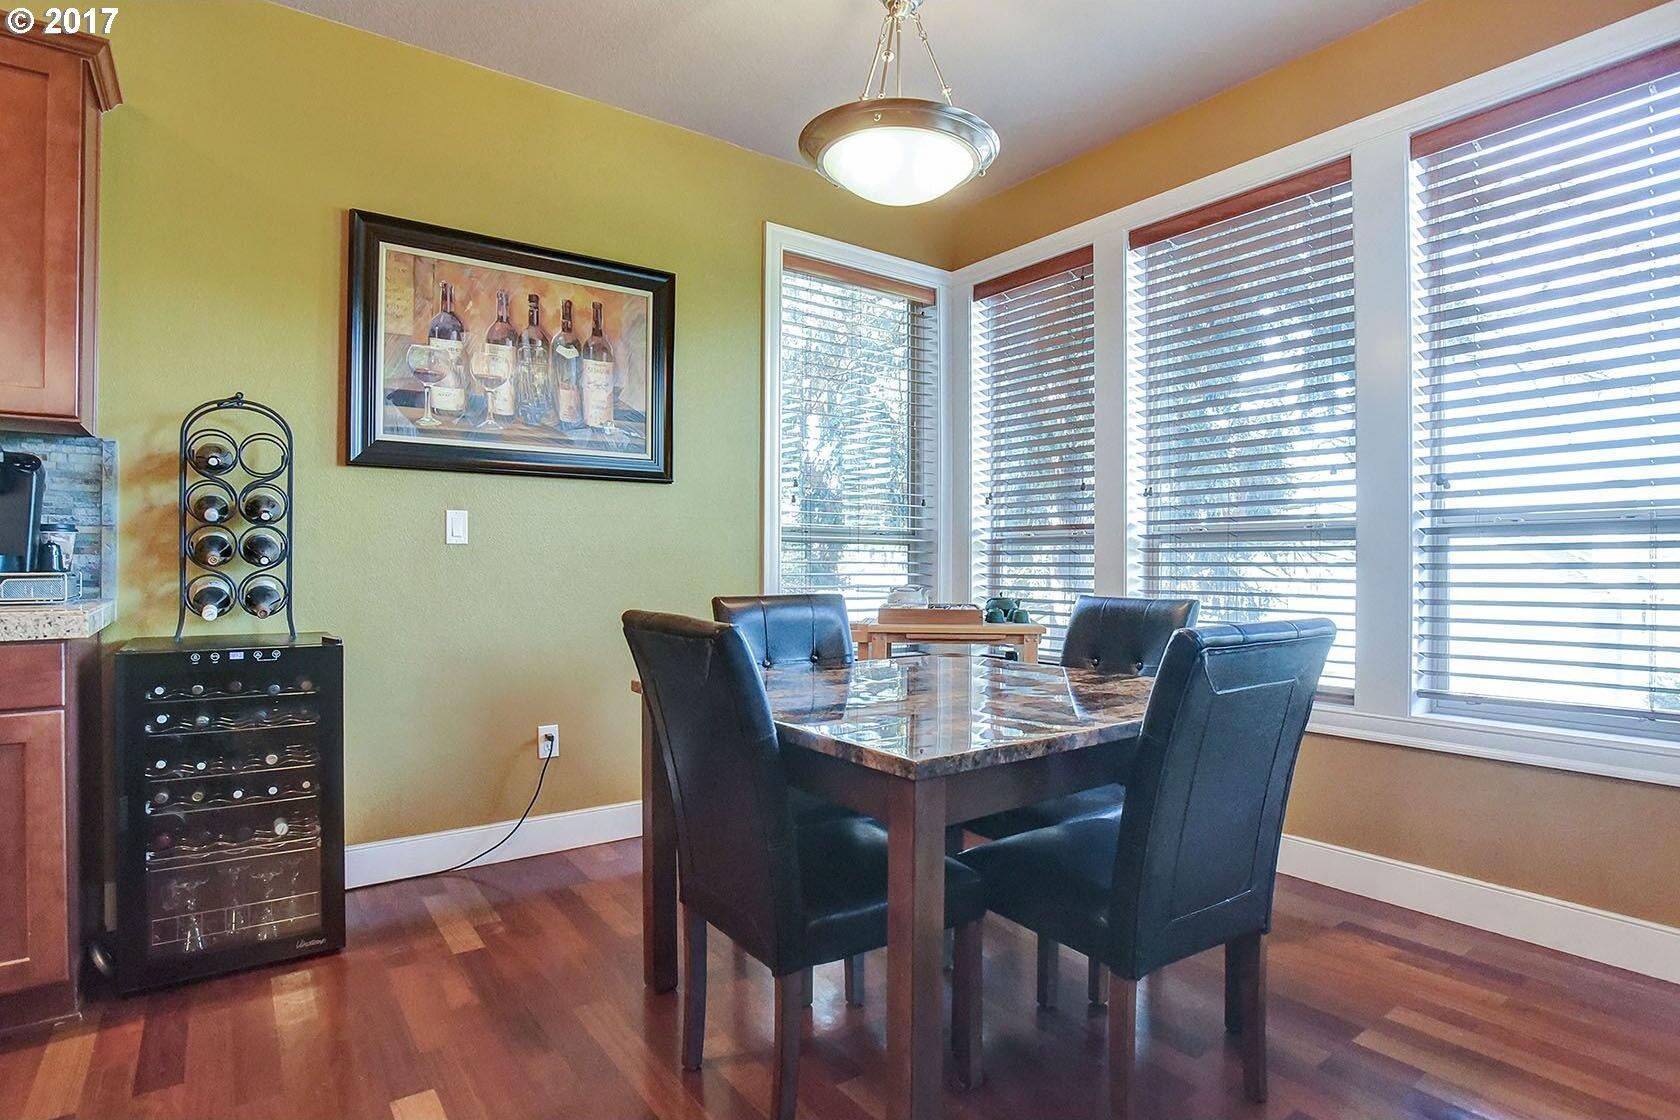 713 SE ANDERSON LN, Gresham, OR 97080 $375,000 MLS#17472237 ...